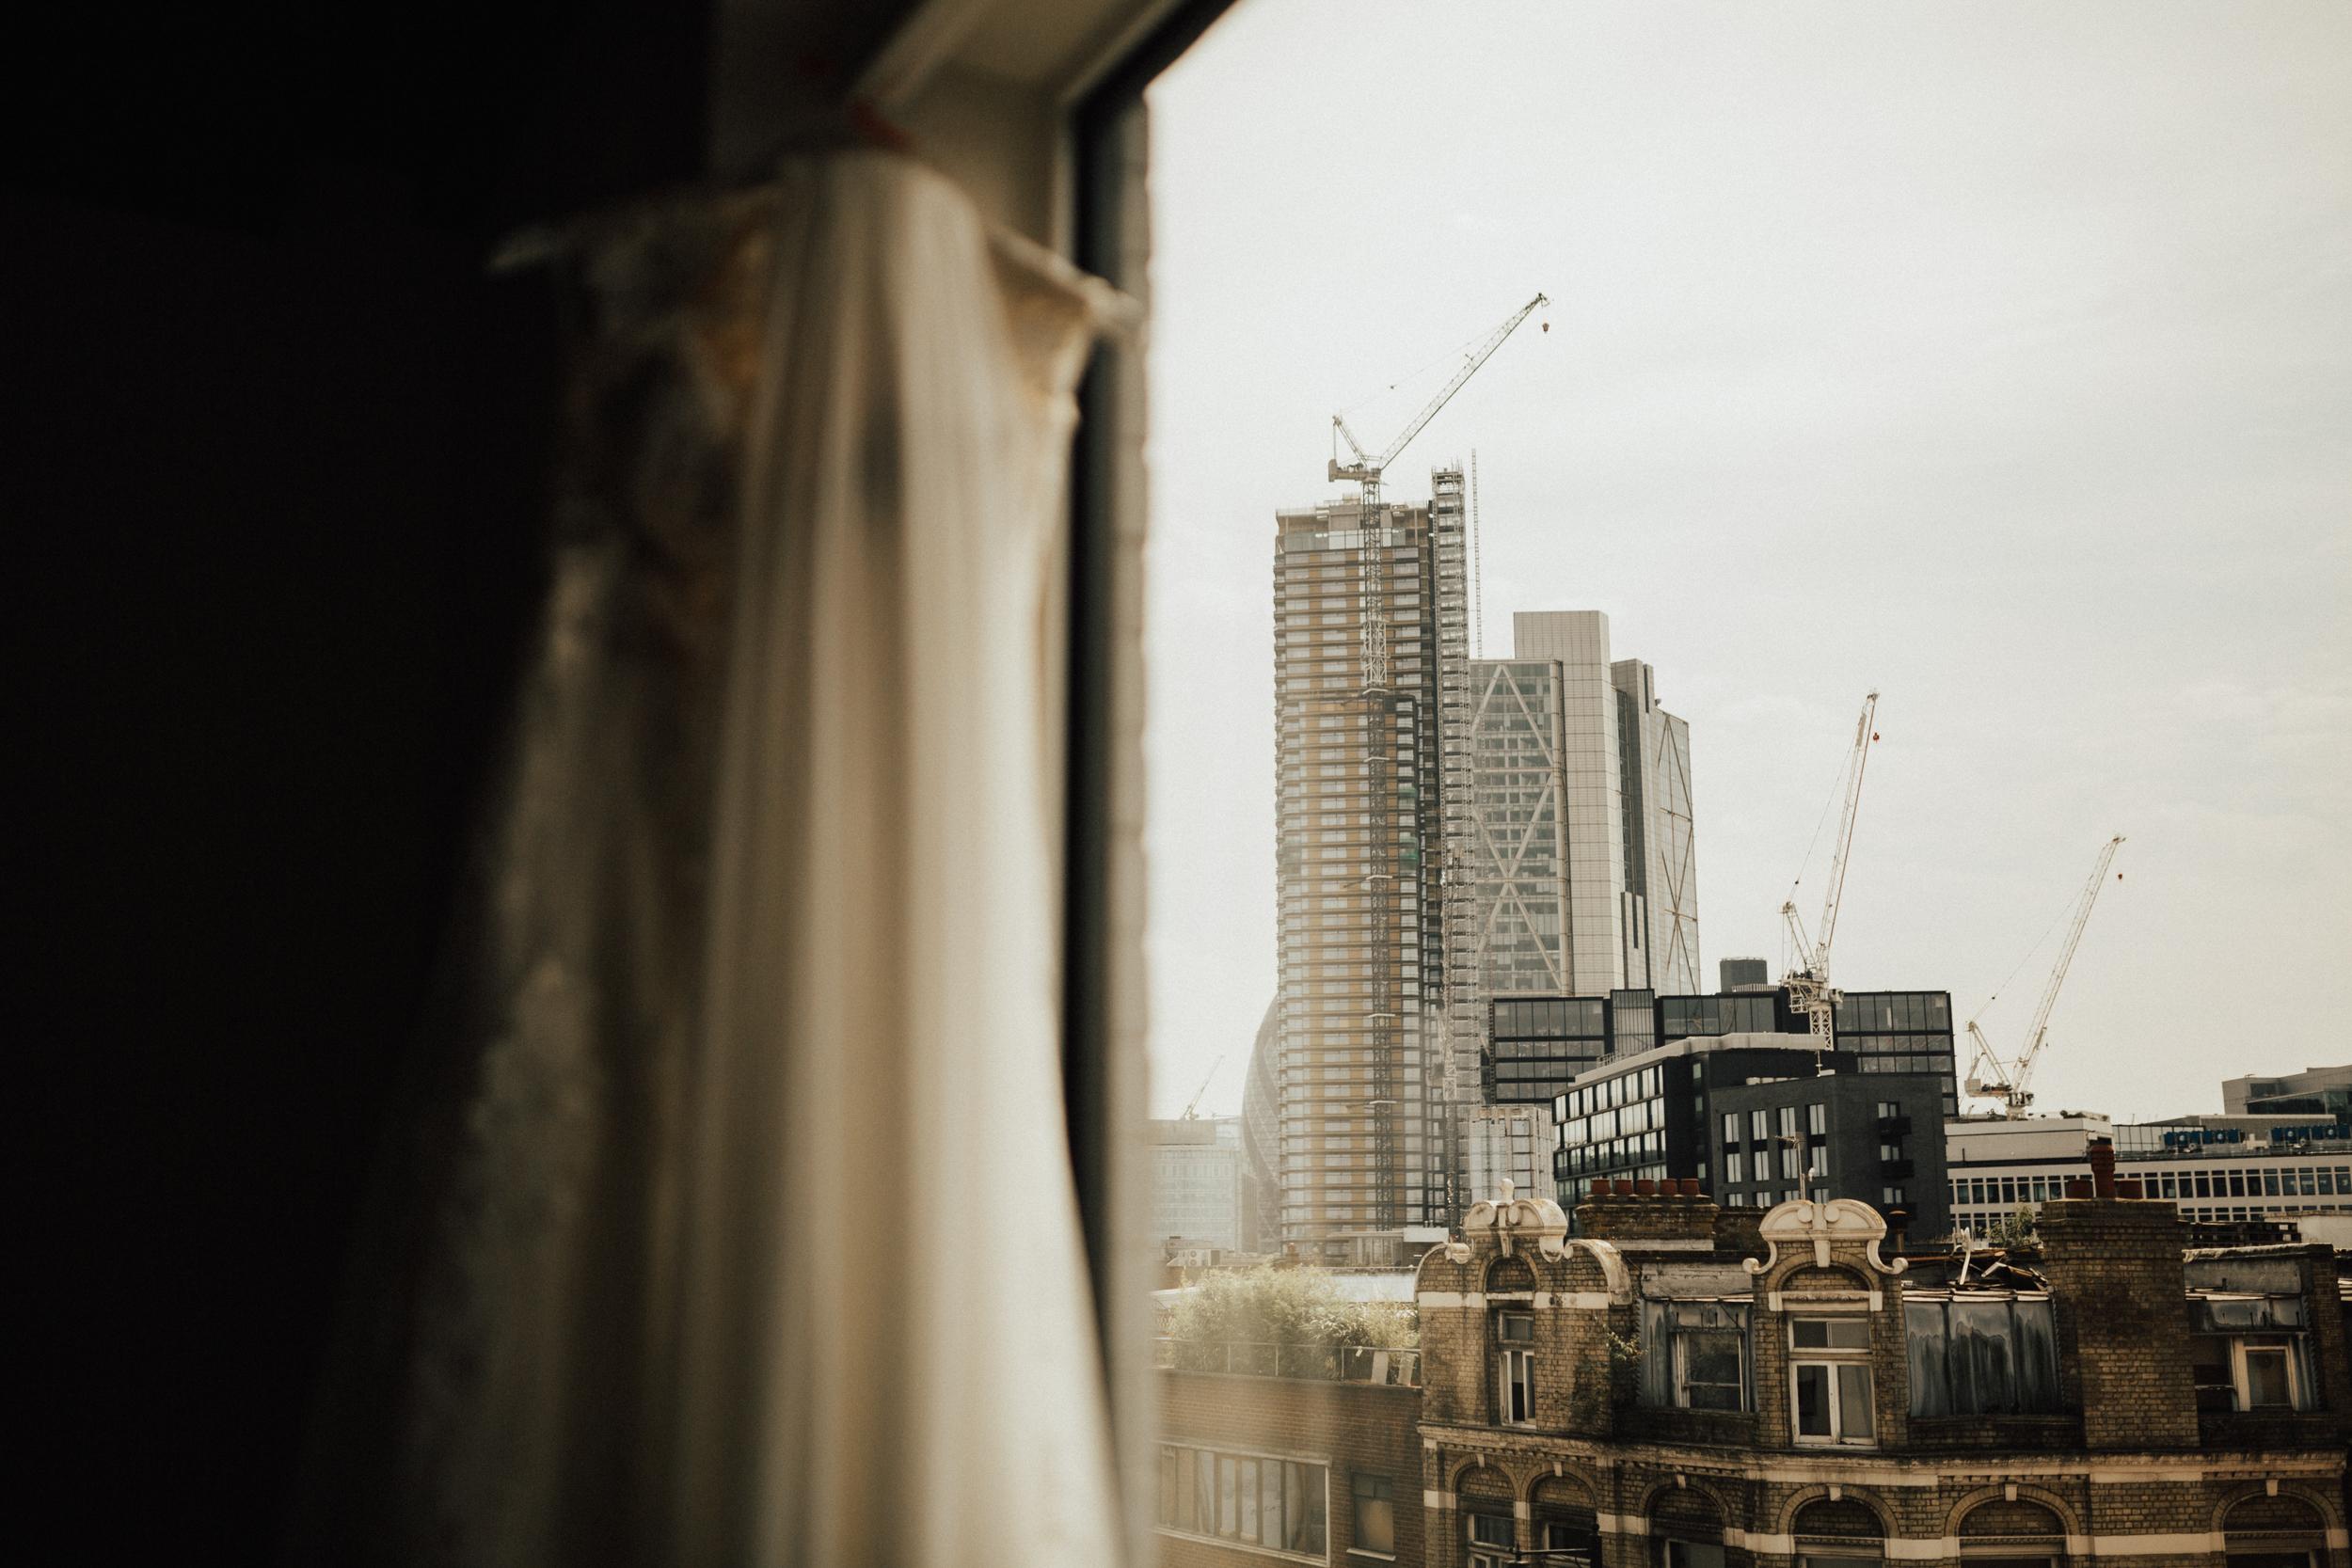 Laura-Benn-The-Asylum-London-The-Ace-Hotel-Wedding-Alternative-Darina-Stoda-Photography-6.jpg